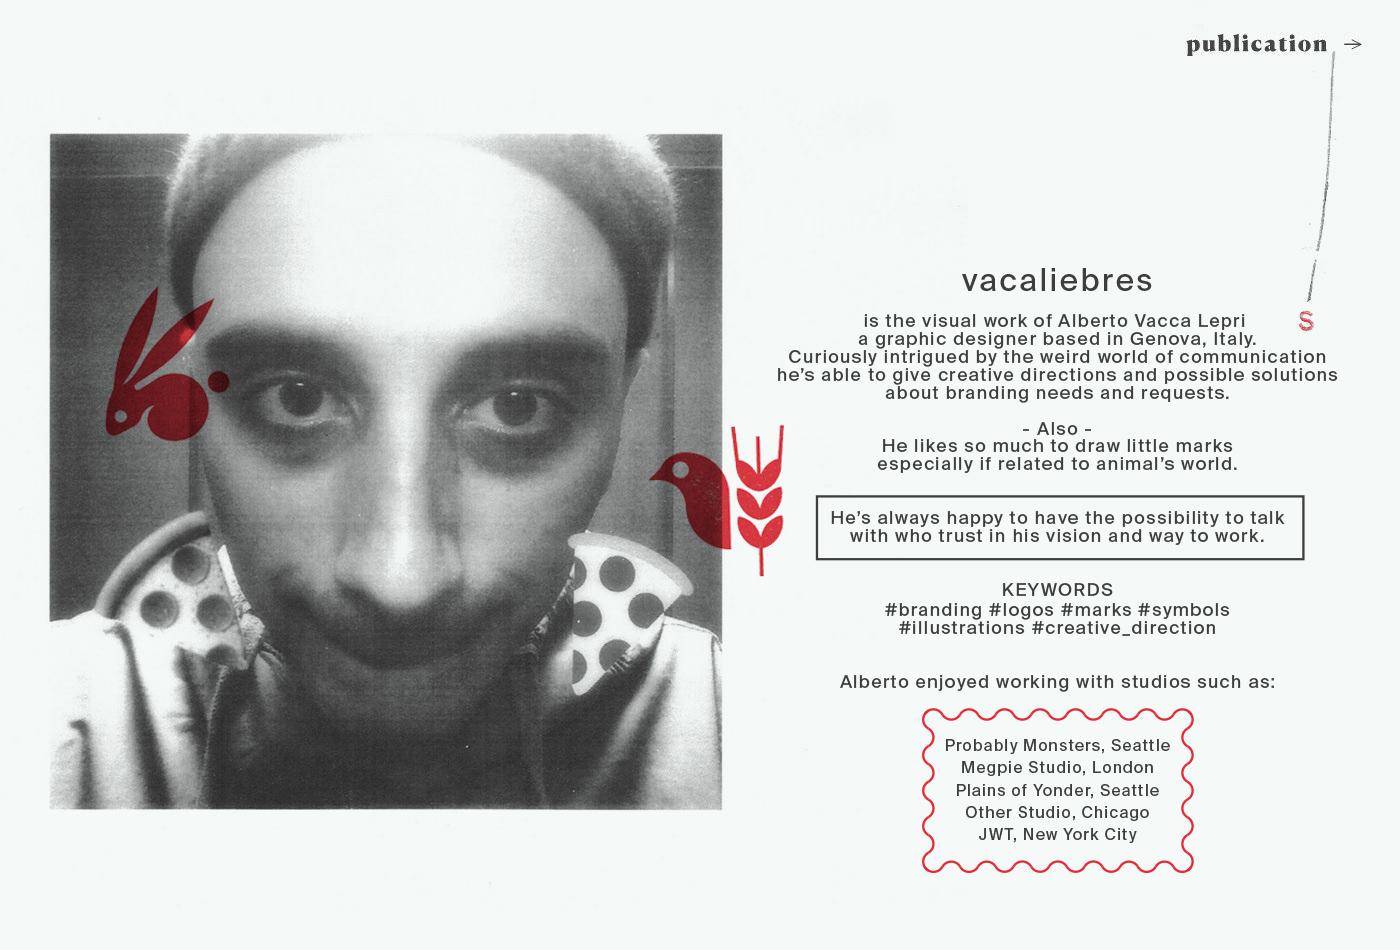 vacaliebres-albertovacca-alberto-vacca-lepri-vaccalepri-genova-logo-branding-logolounge-alberto-vacca